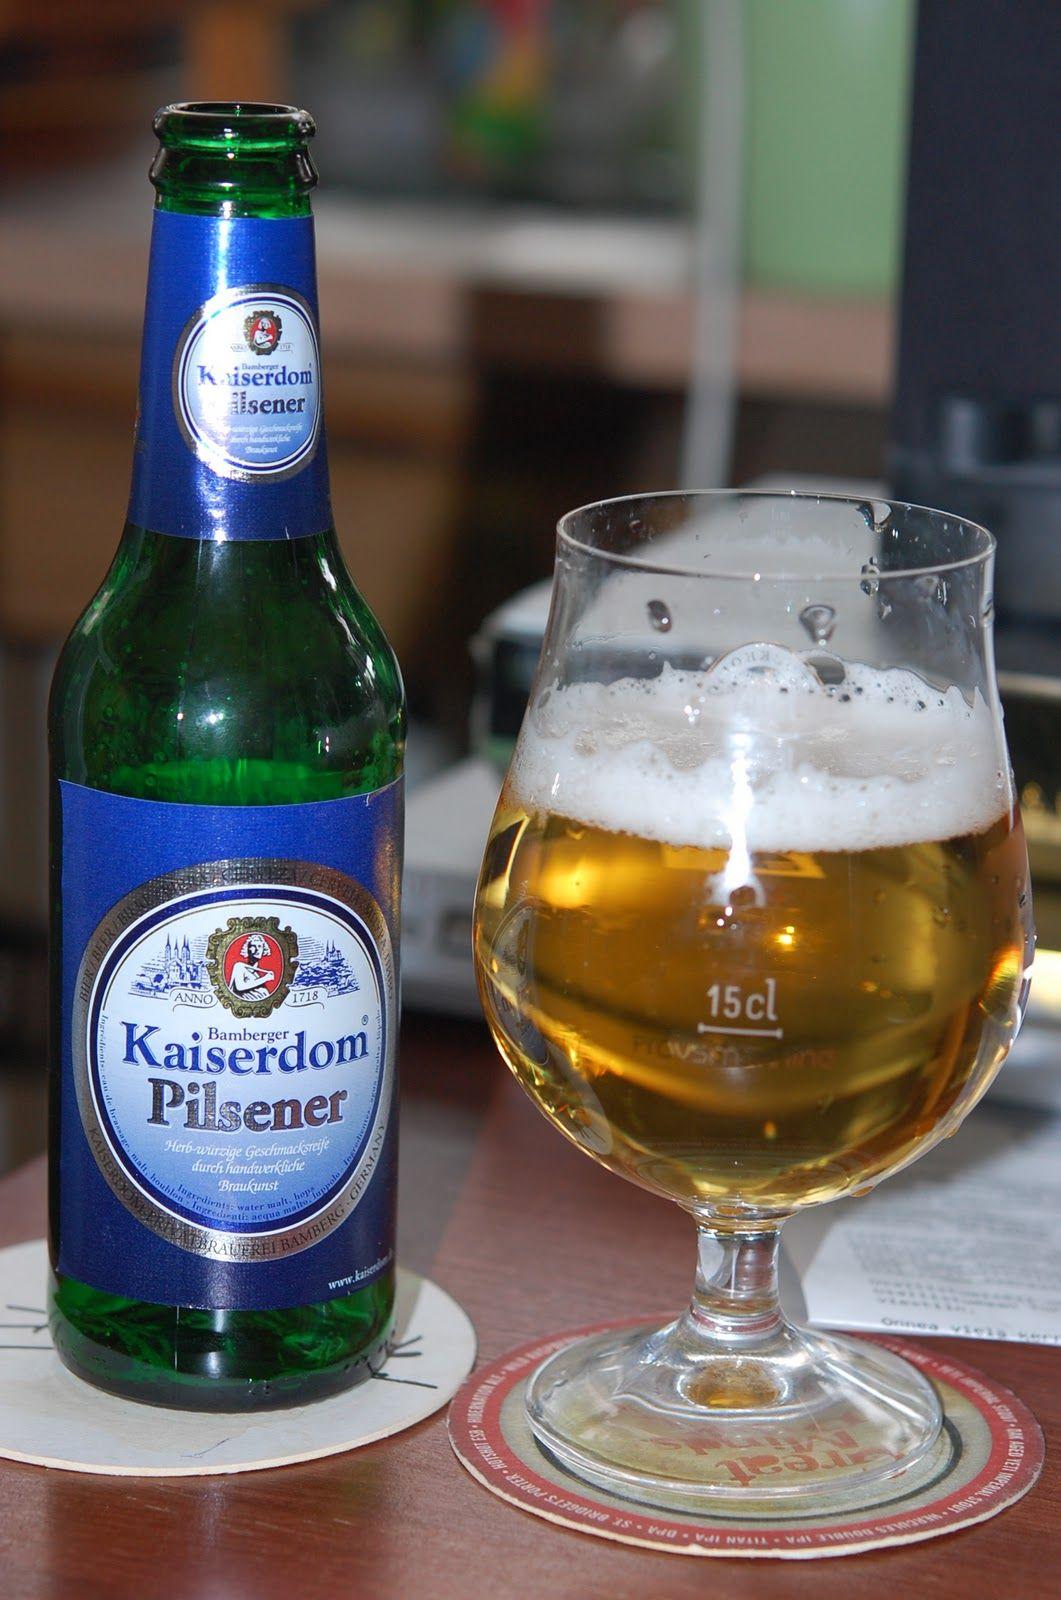 Kaiserdom Privatbrauerei - Kaiserdom Pilsener 4,8% pullo